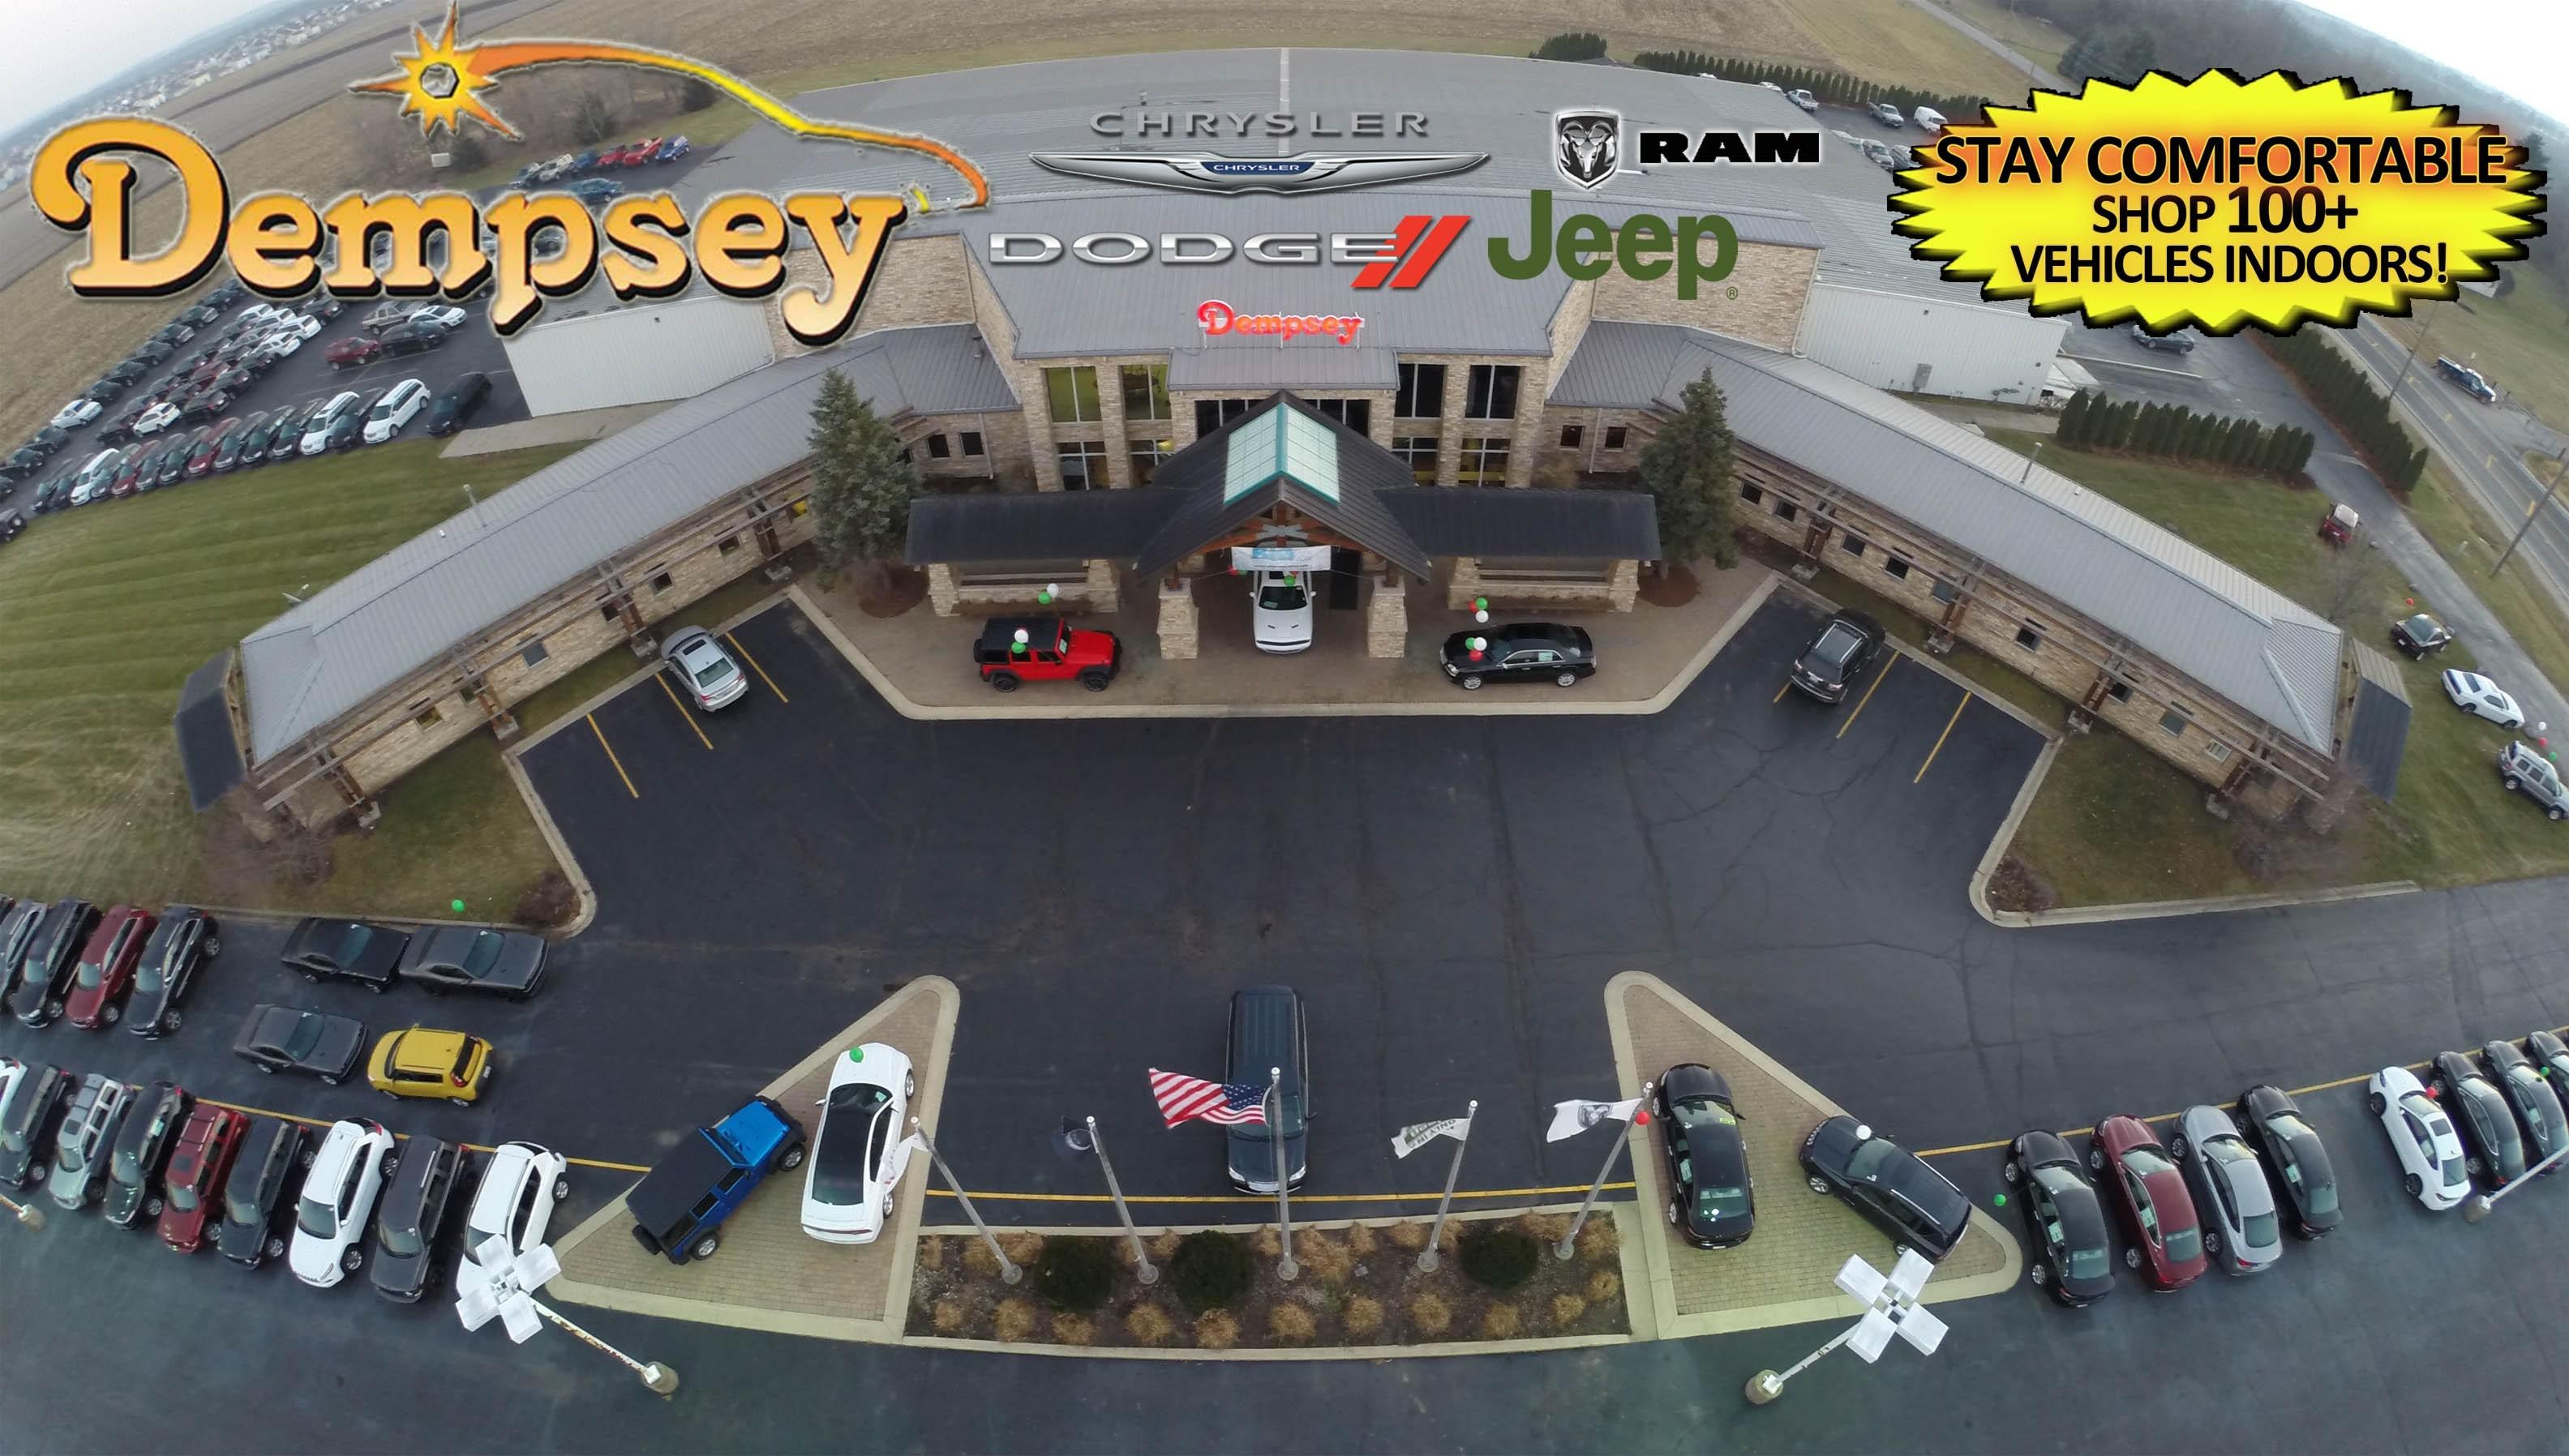 Top Value Car Truck Services Center